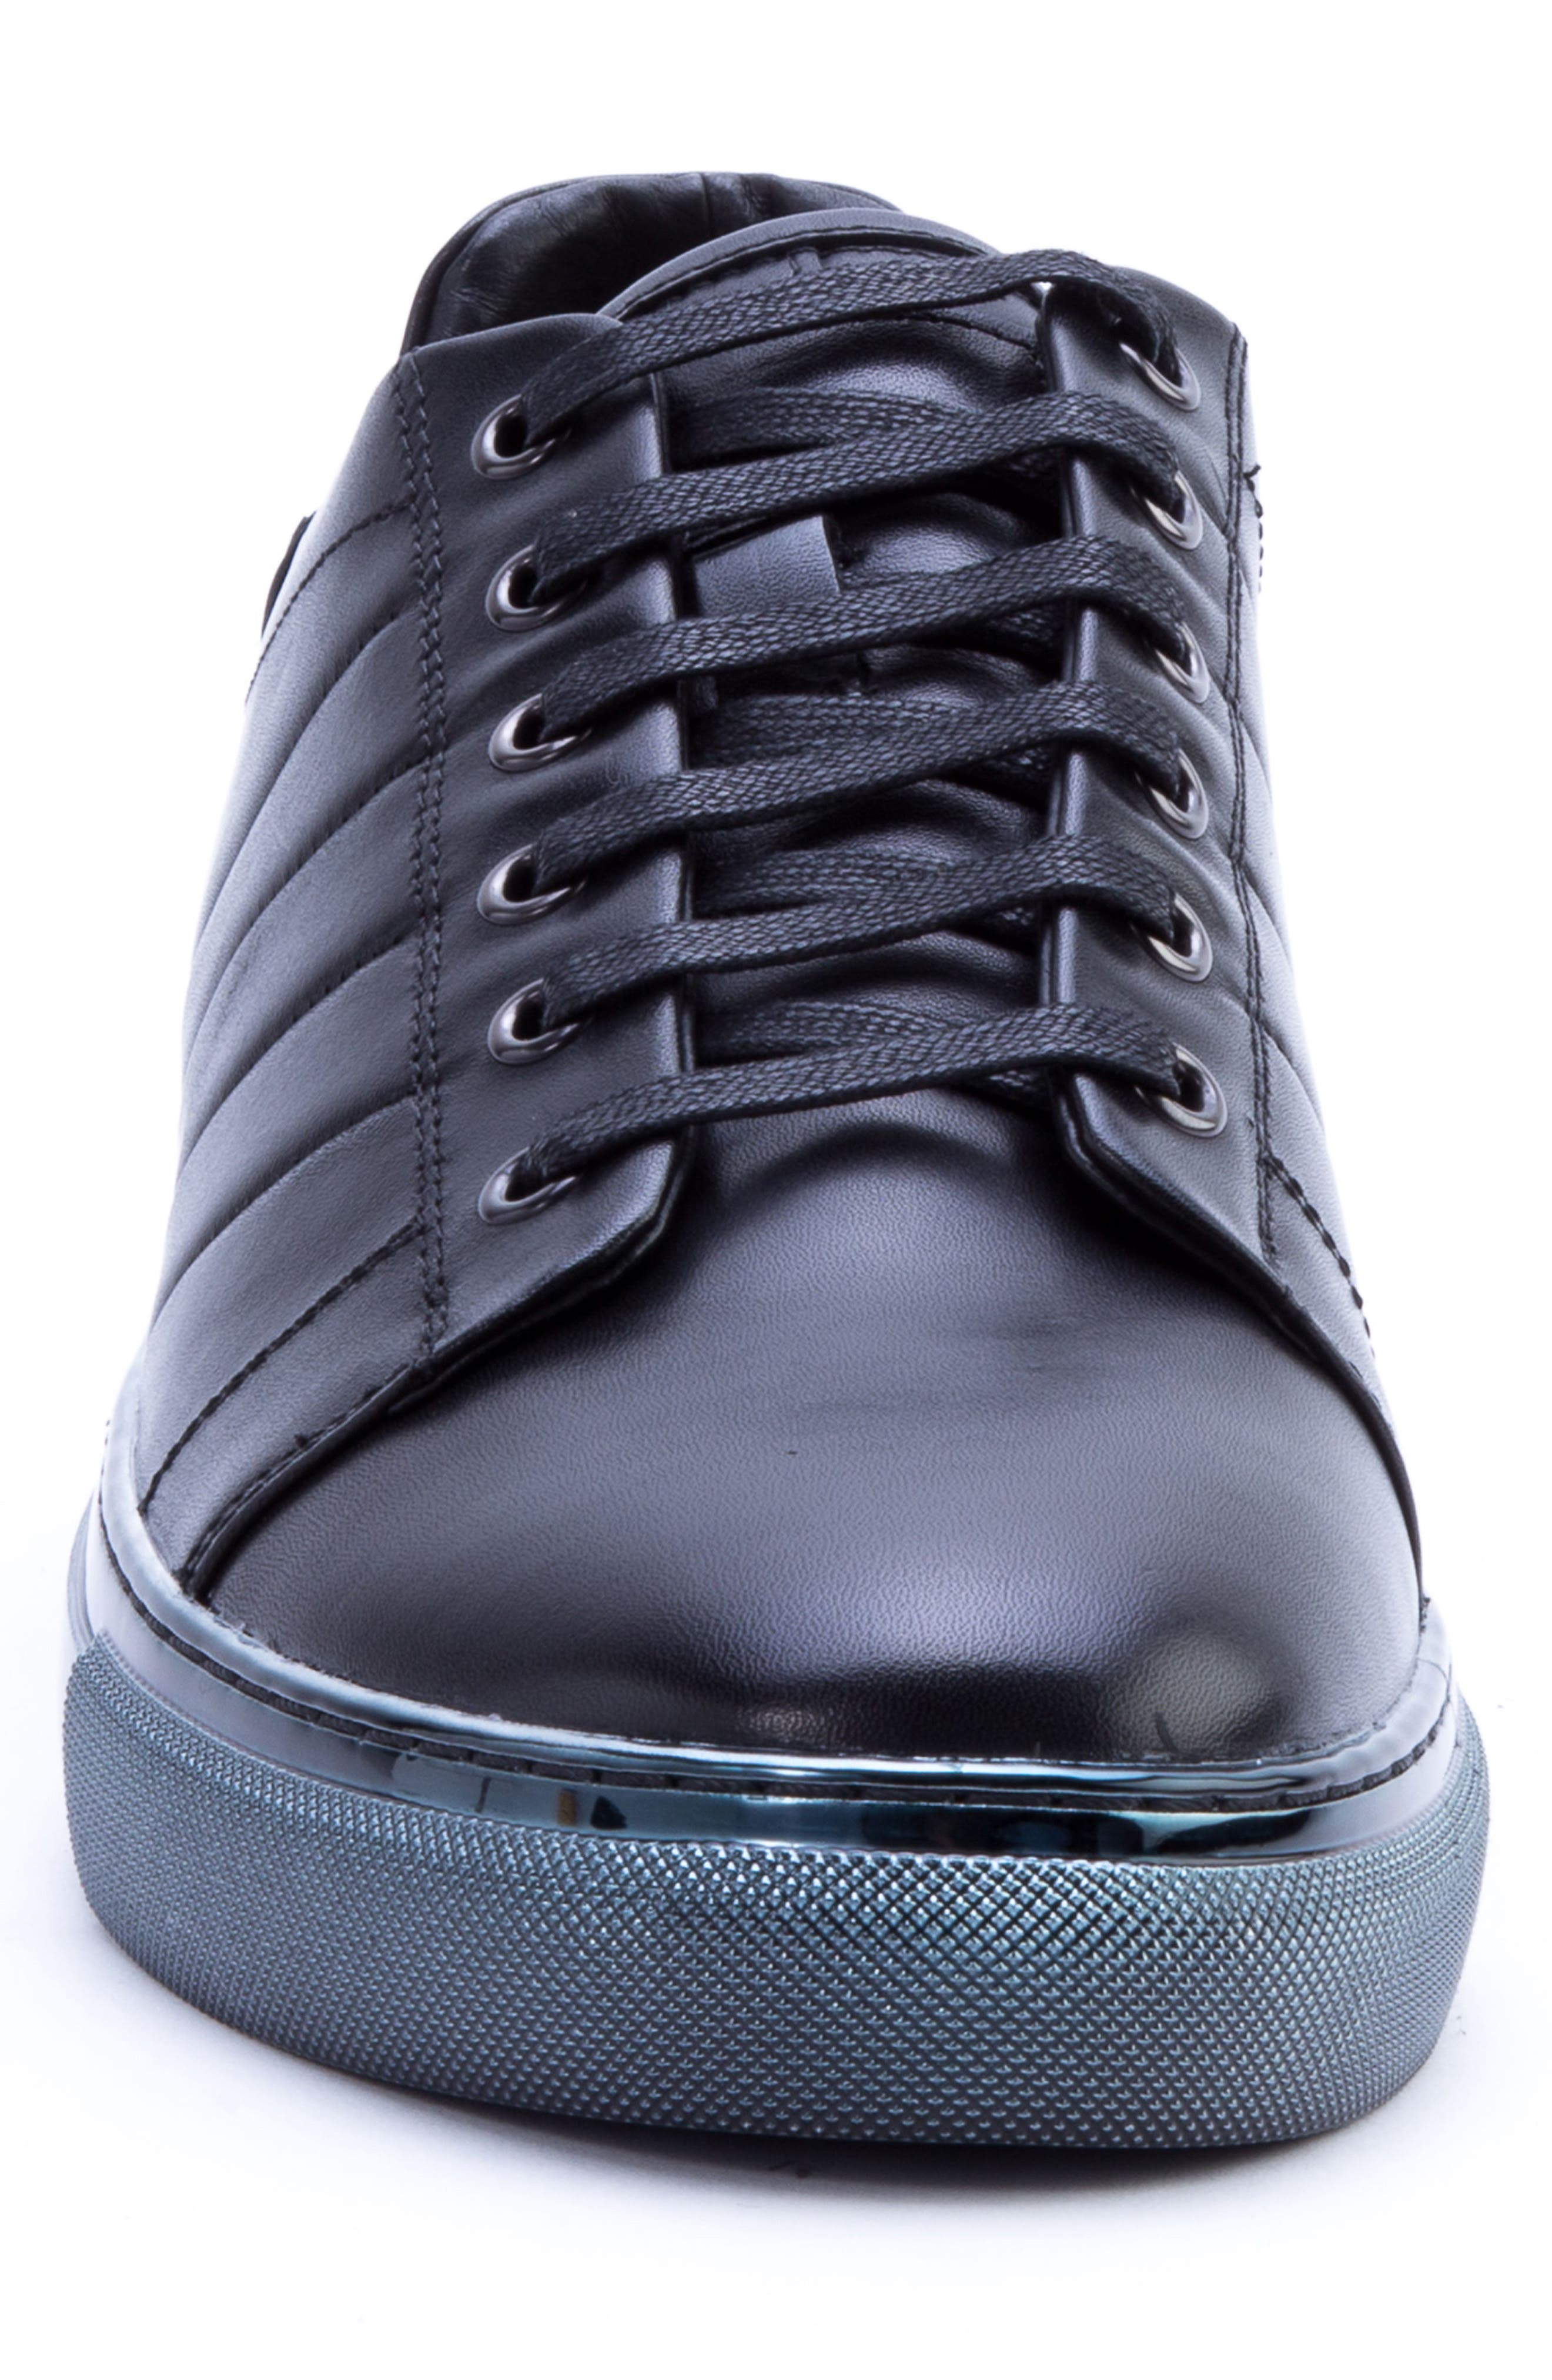 BADGLEY MISCHKA COLLECTION, Badgley Mischka Brando Sneaker, Alternate thumbnail 4, color, BLACK LEATHER